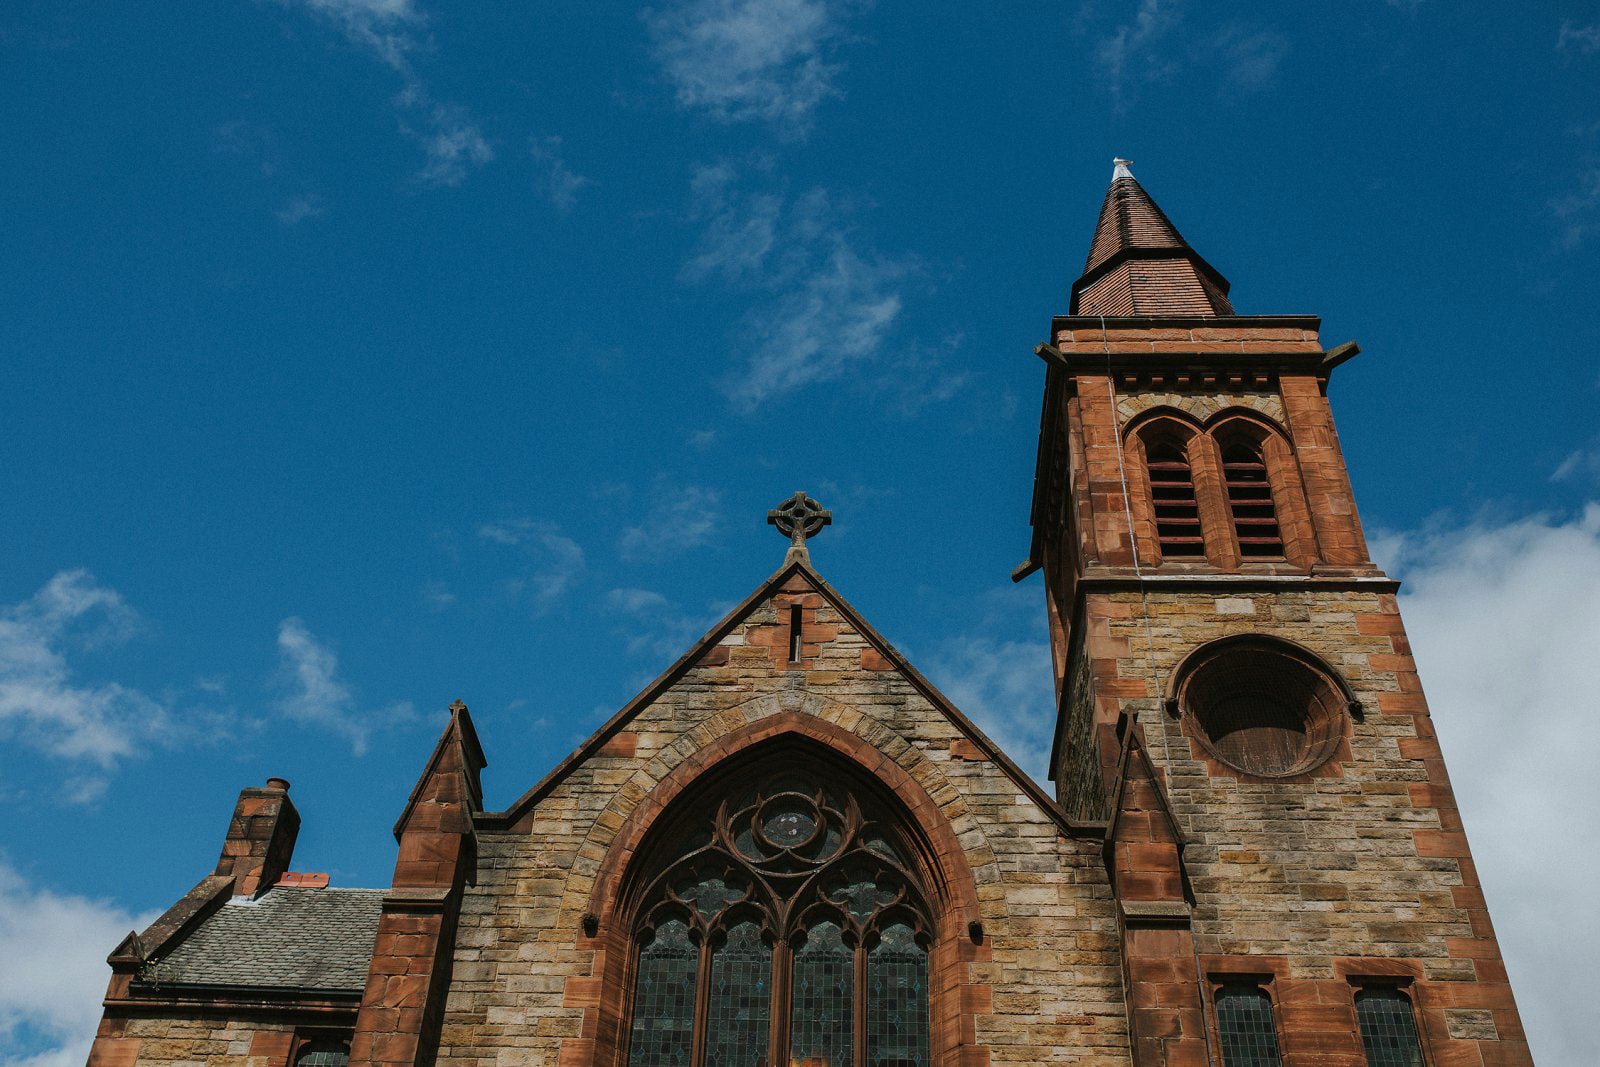 Gorgie Dalry Stenhouse Church